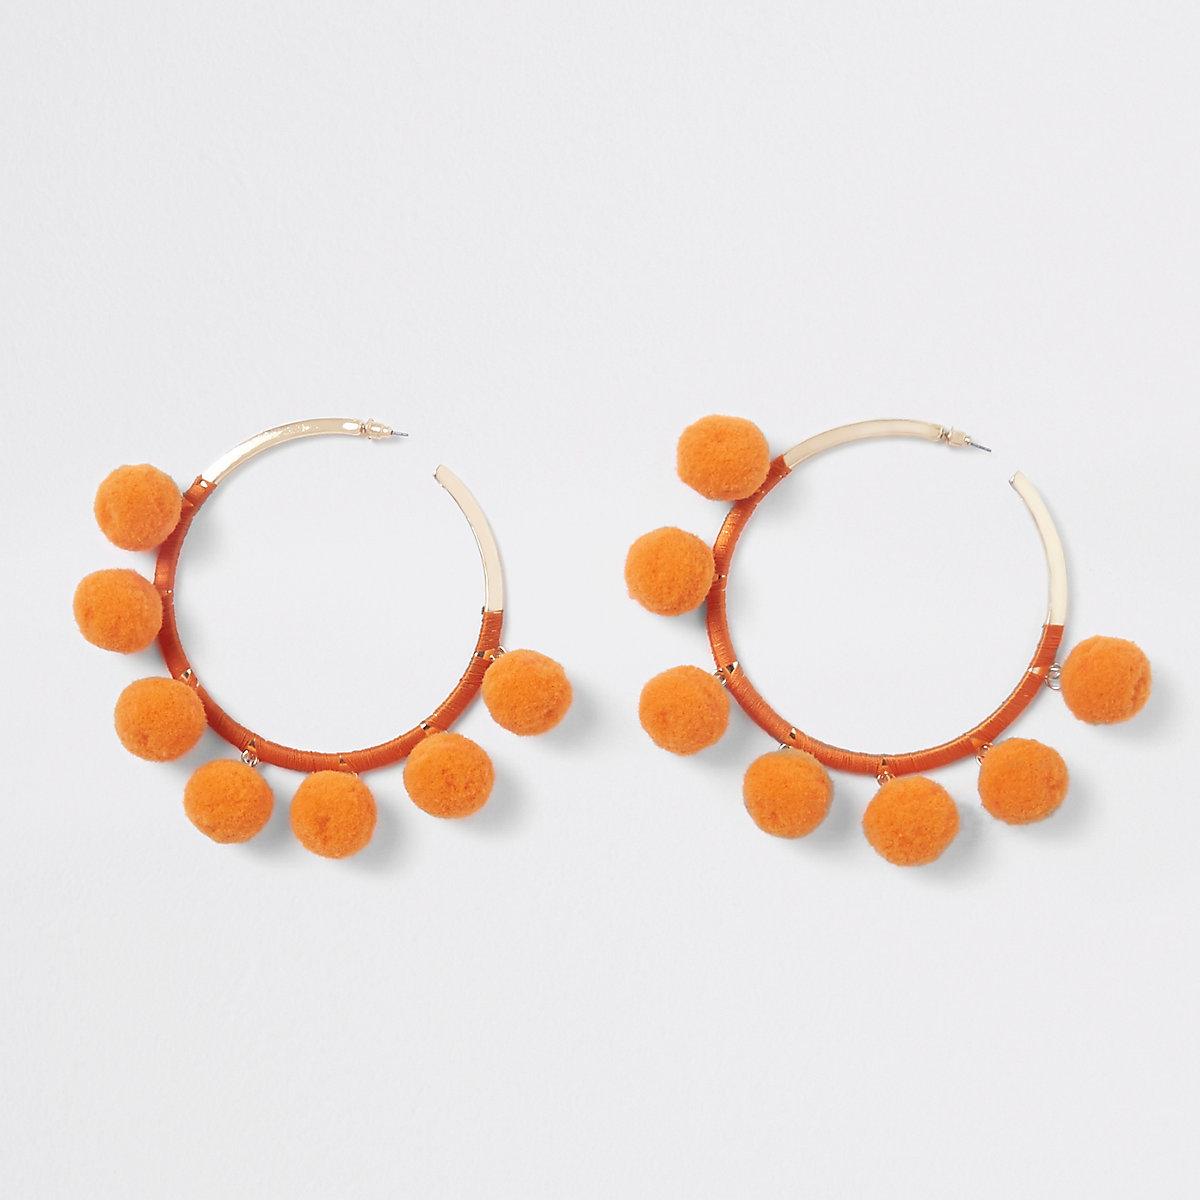 Orange gold tone pom pom hoop earrings